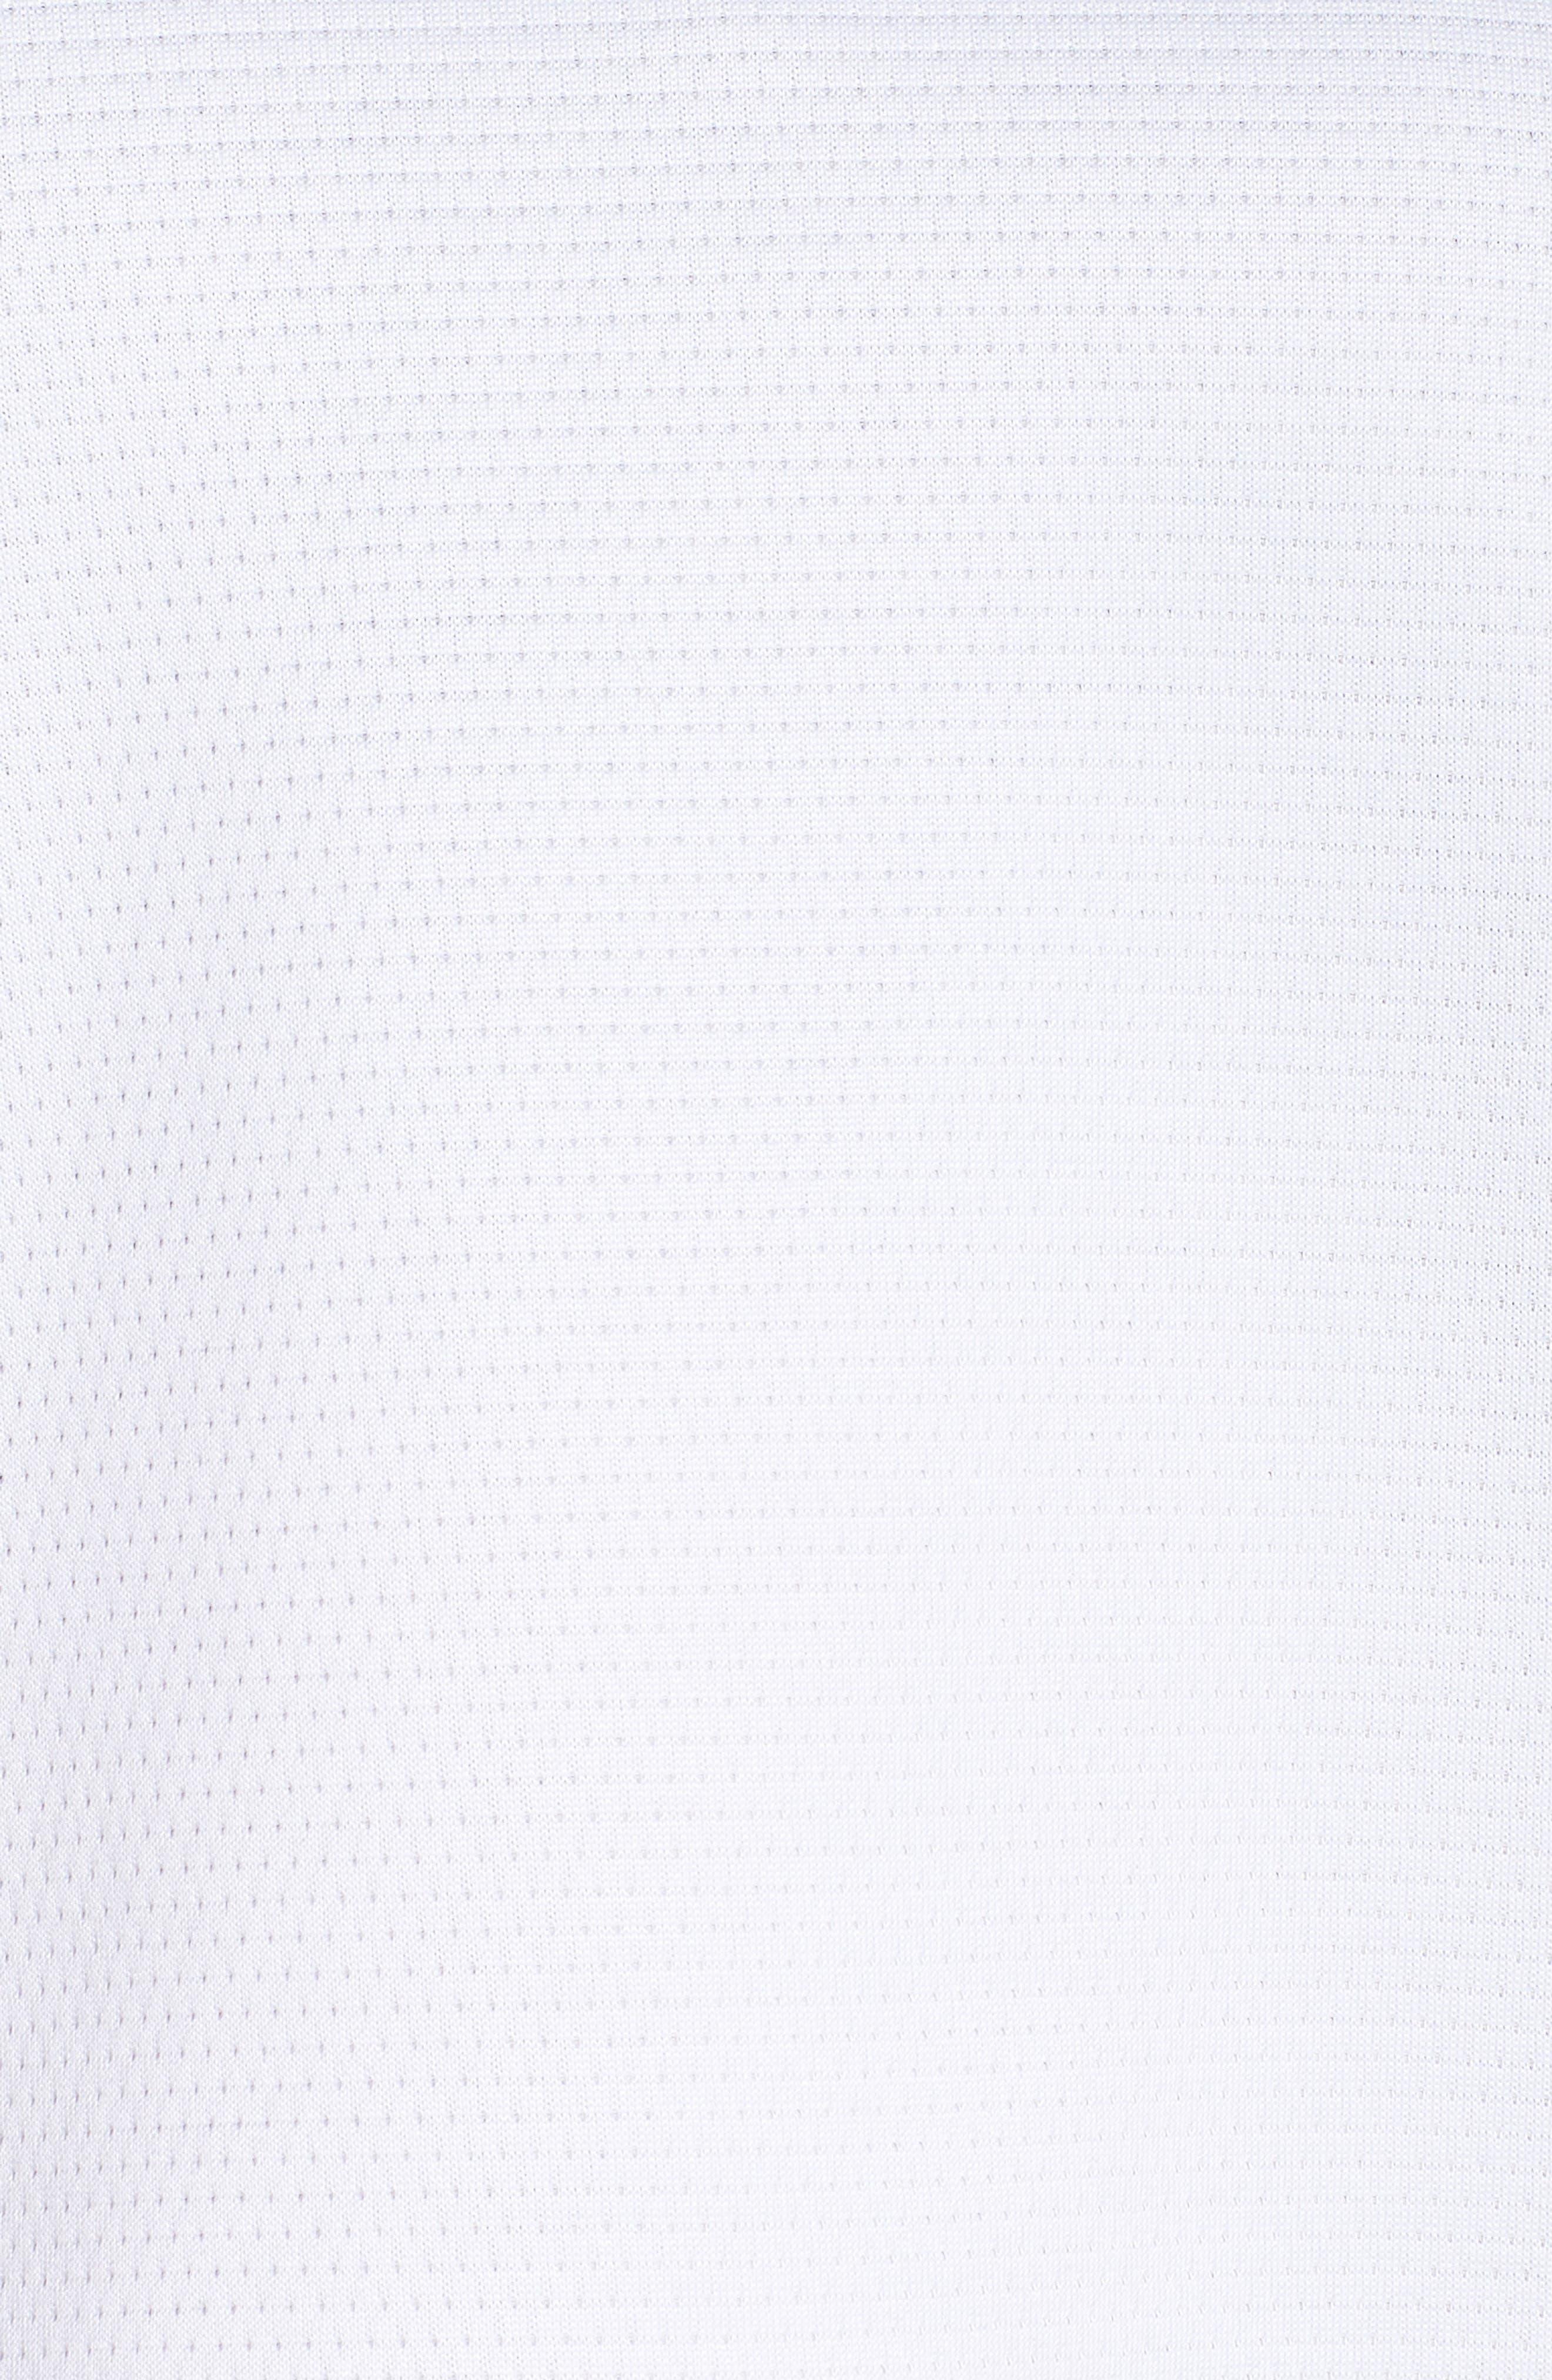 Sportswear Teched Out Tank,                             Alternate thumbnail 6, color,                             White/ Black